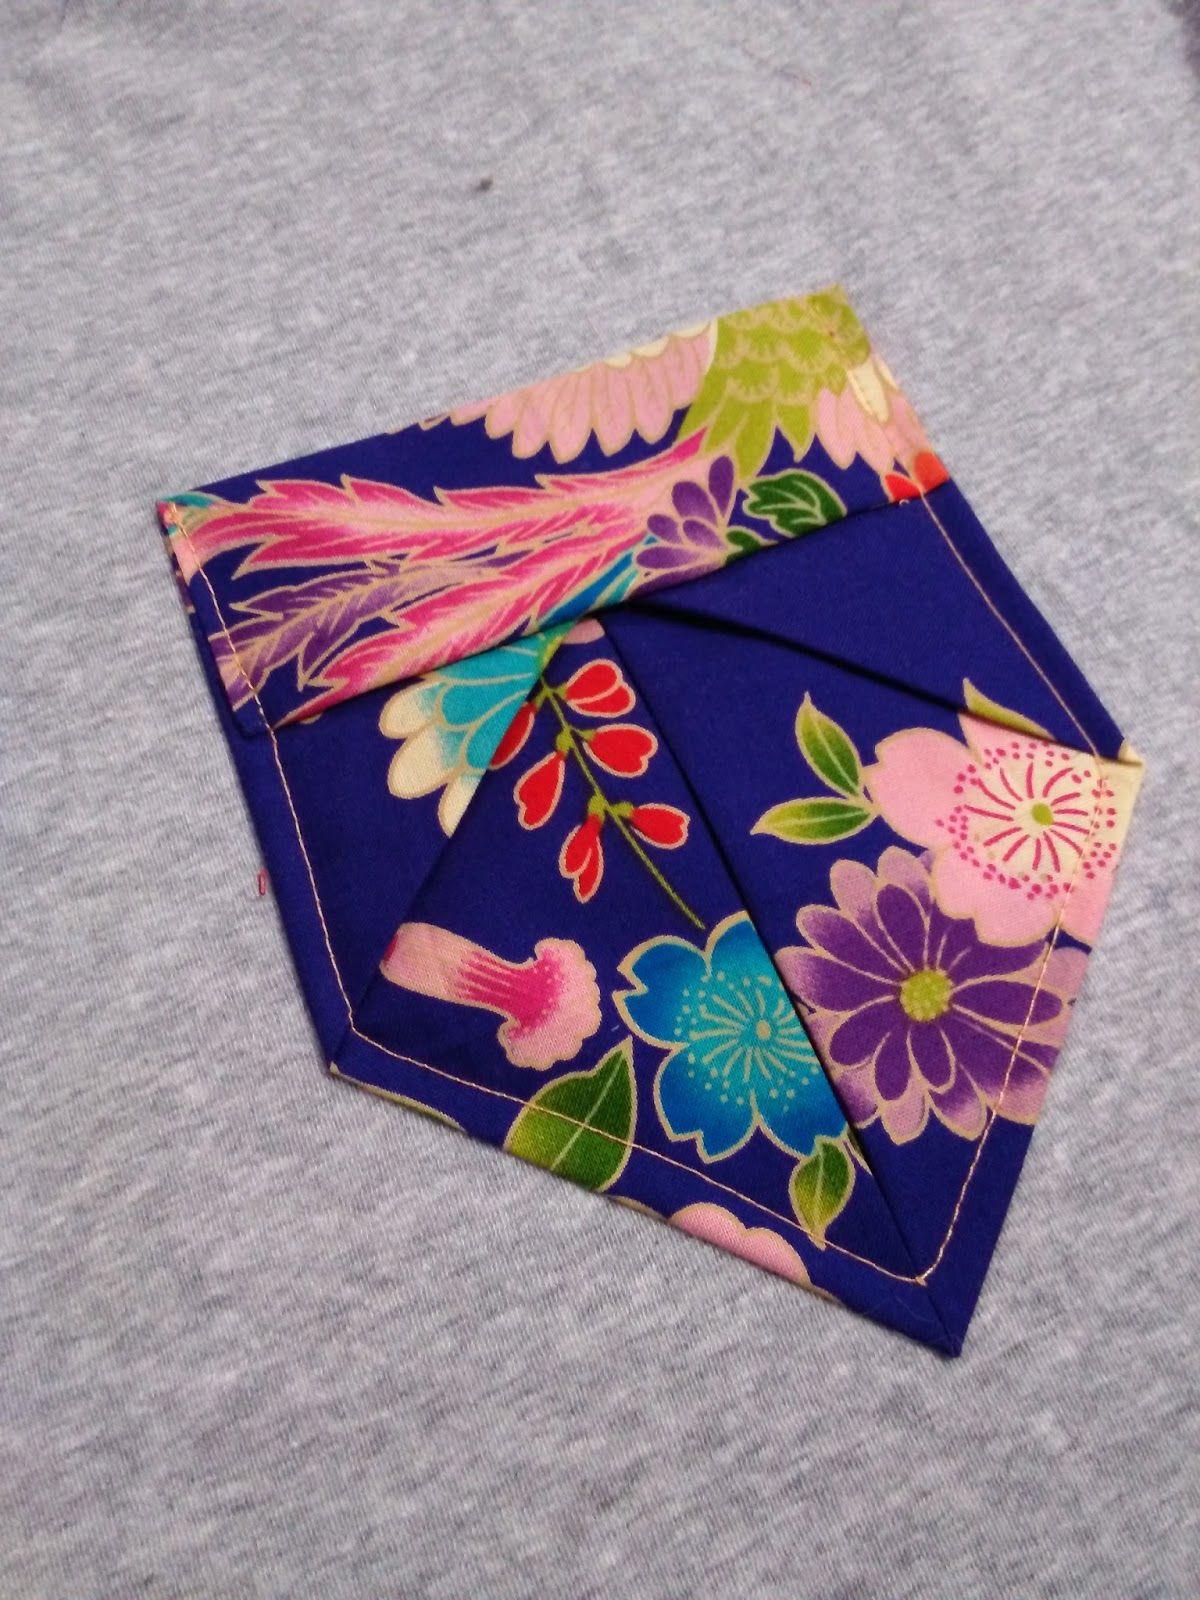 Te atreves a alegrar una camiseta con un bolsillo de origami esta te atreves a alegrar una camiseta con un bolsillo de origami esta es la thecheapjerseys Images